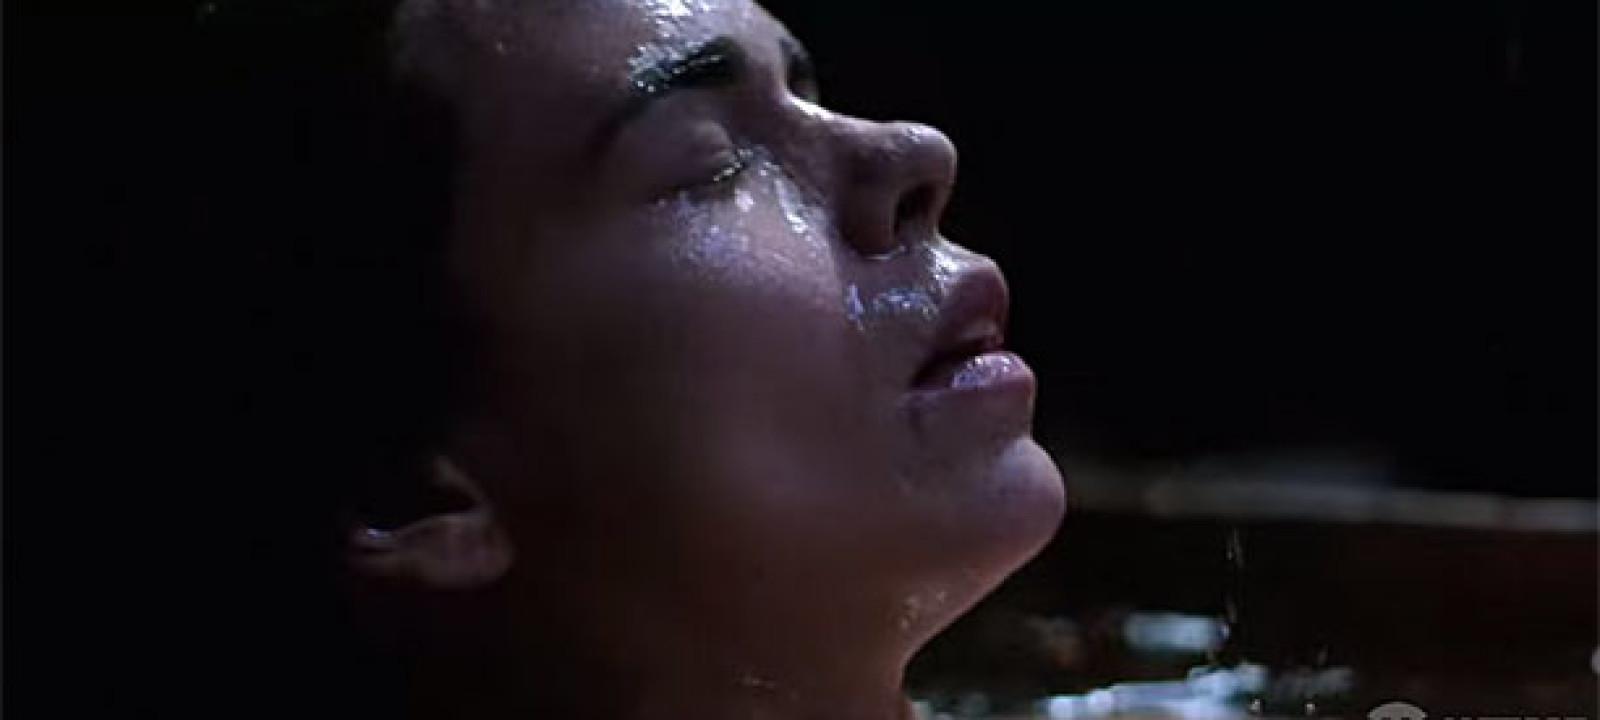 Billie Piper in 'Penny Dreadful'